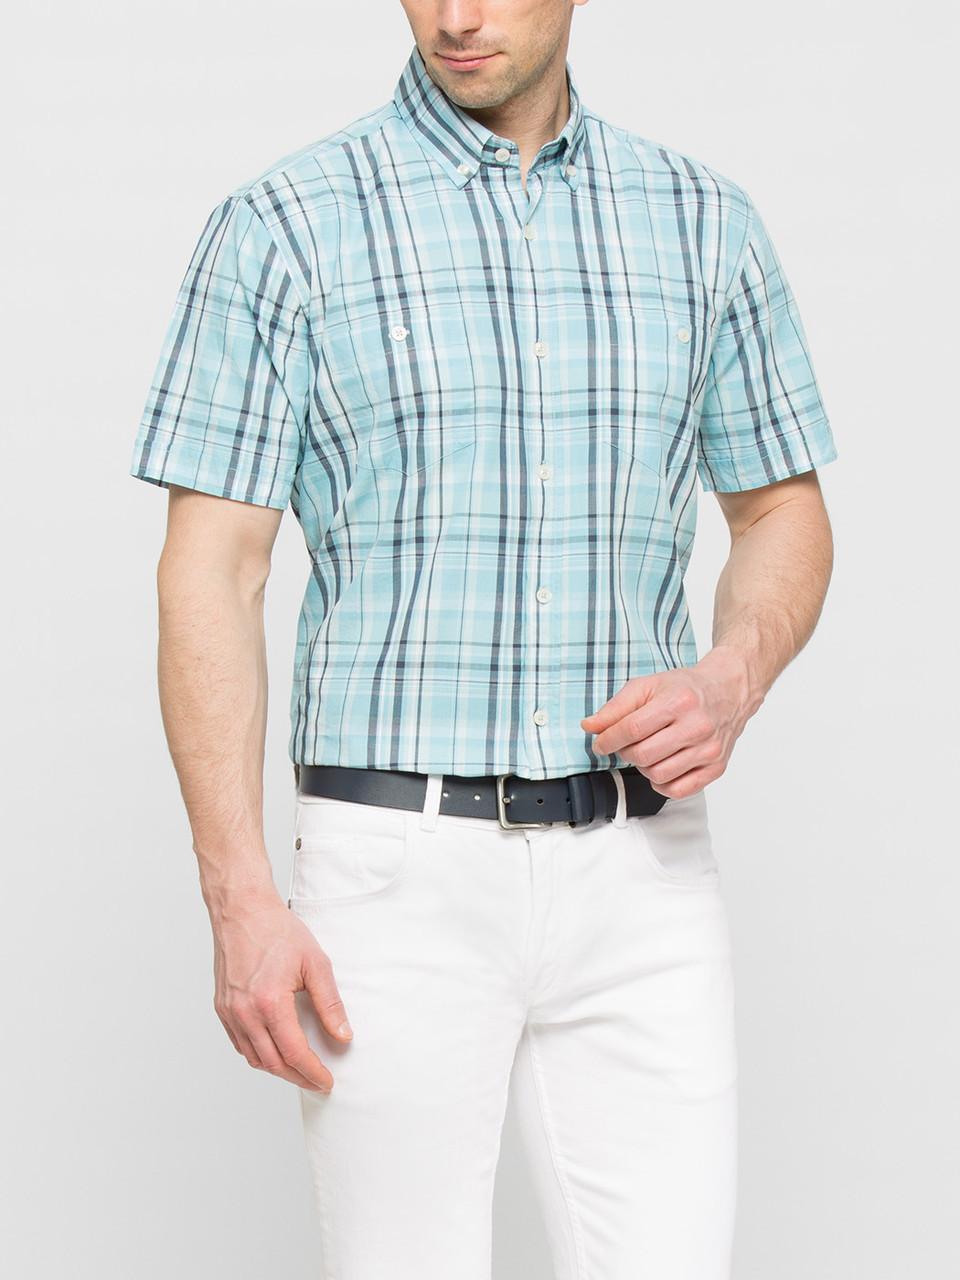 bfeef6671053c2e Мужская рубашка LC Waikiki с коротким рукавом голубого цвета в полоску -  Интернет-магазин